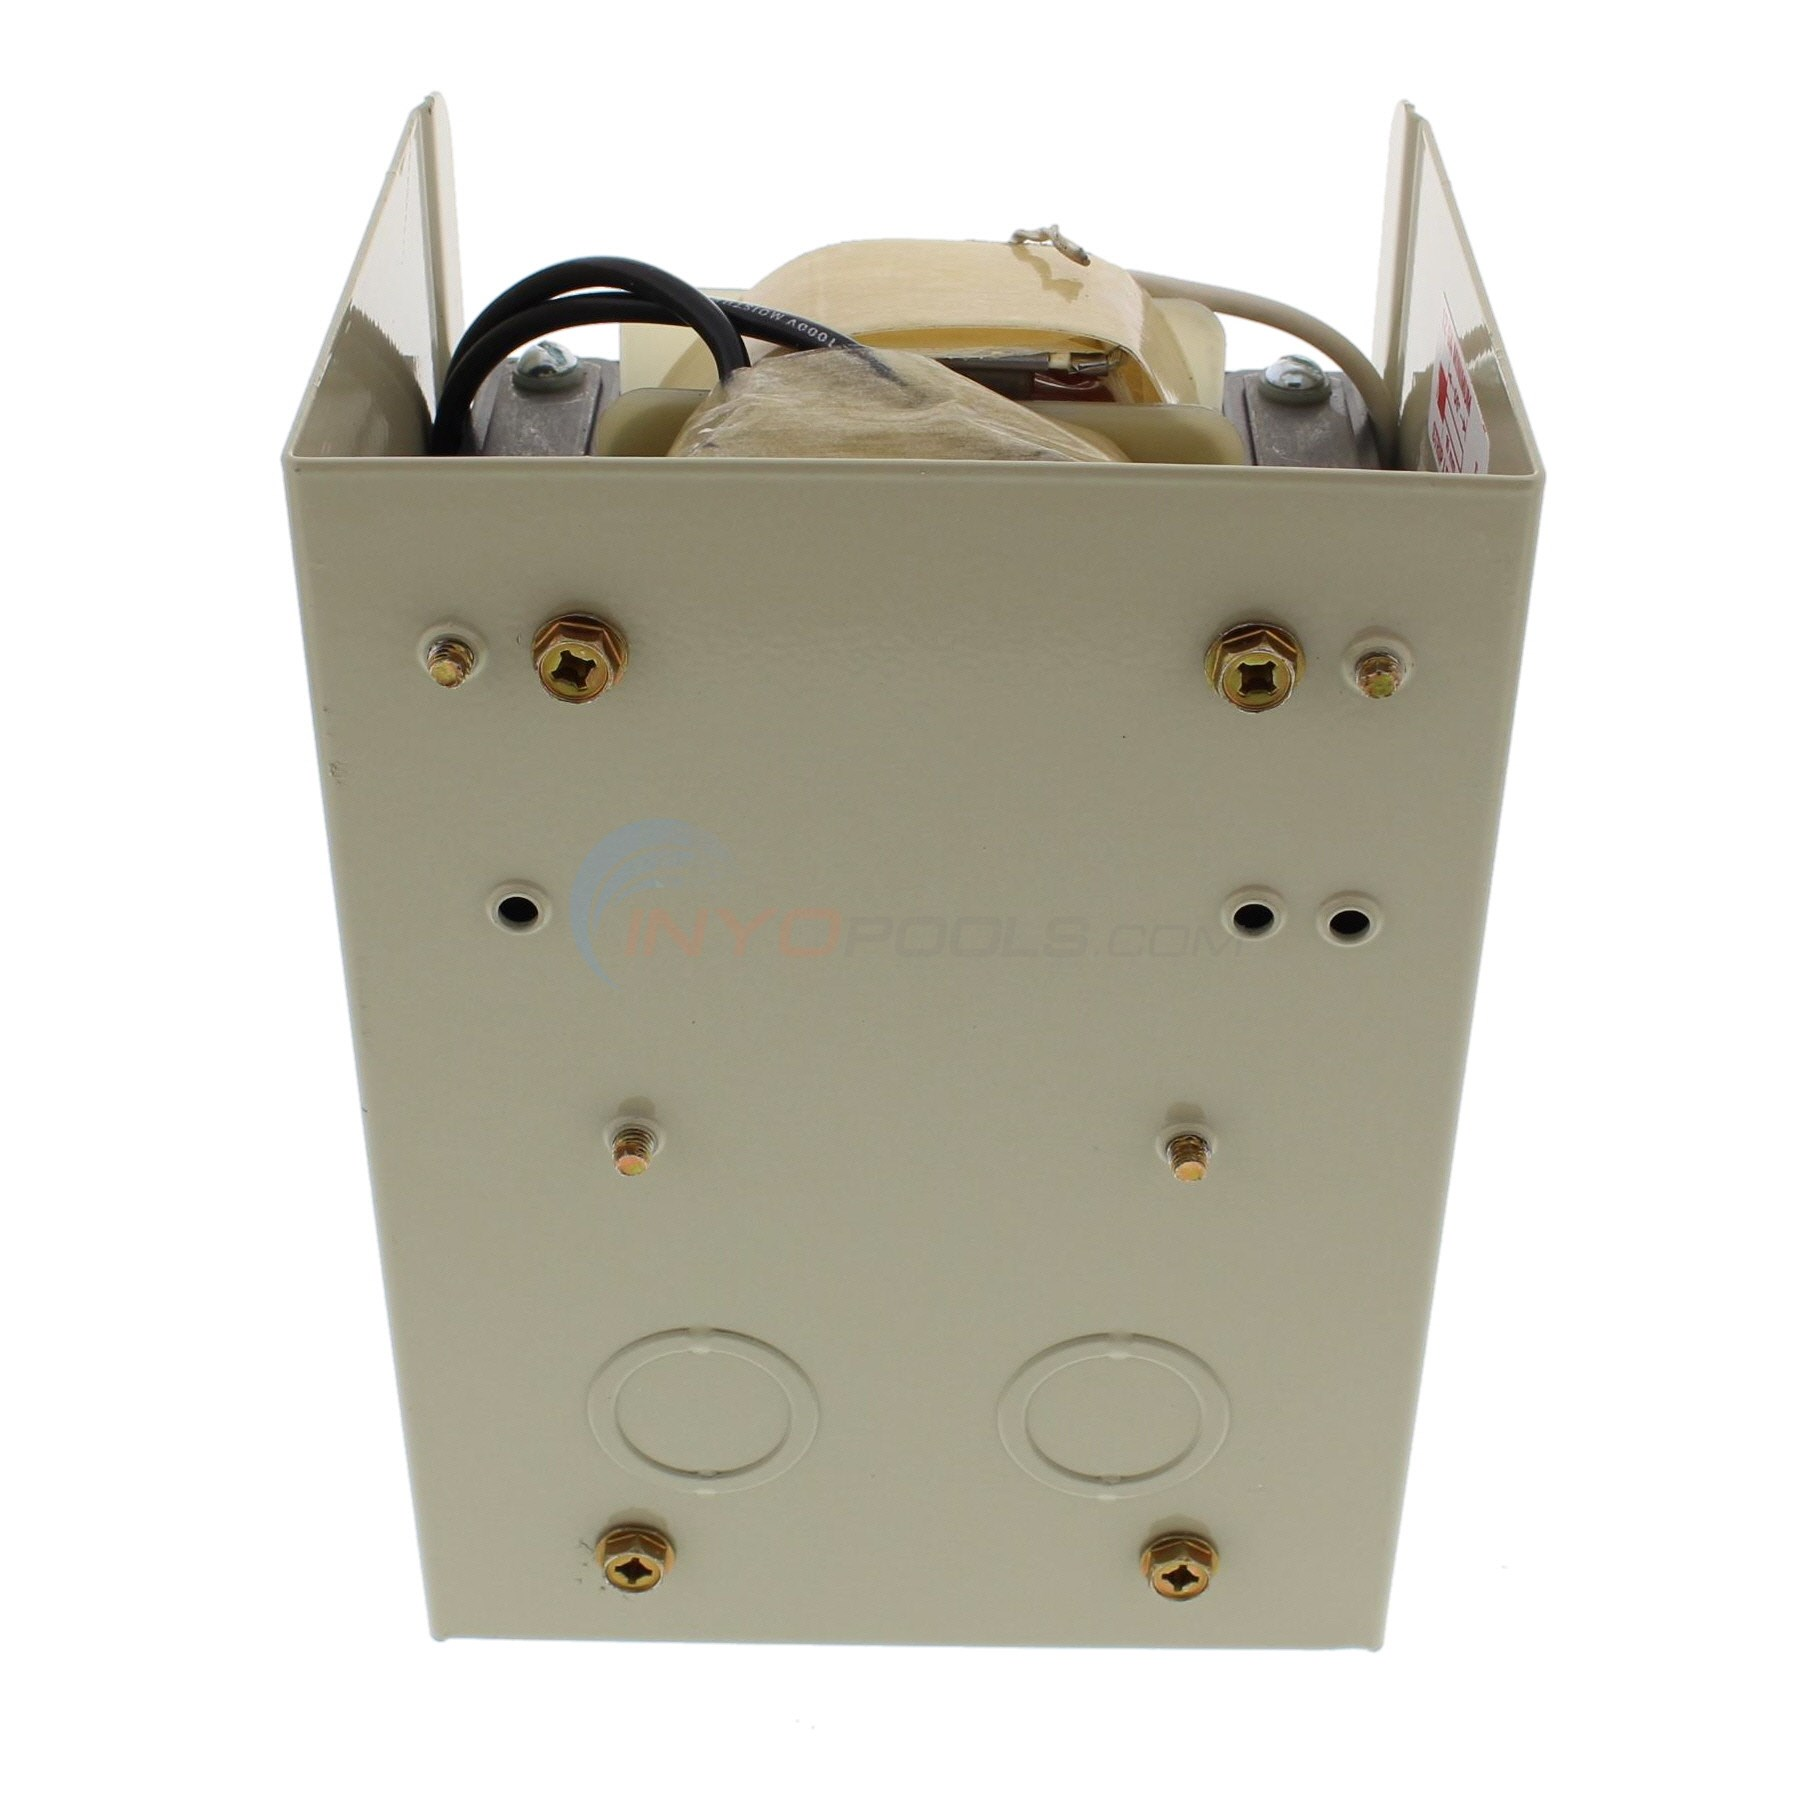 intermatic 300 watt transformer wiring diagram intermatic